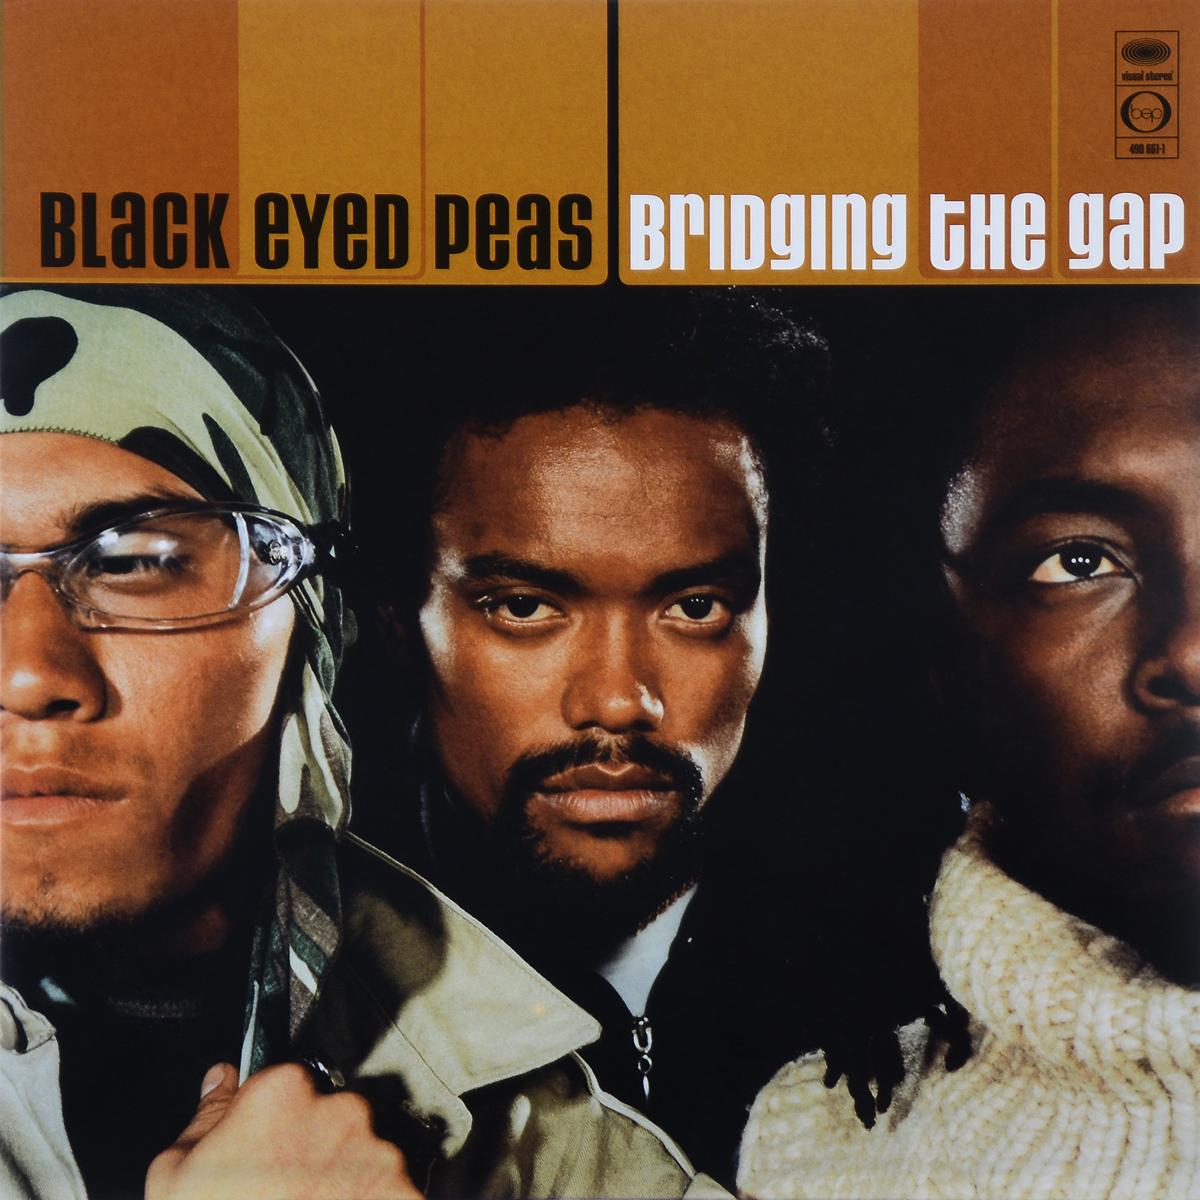 The Black Eyed Peas Black Eyed Peas. The Bridging The Gap (2 LP) black eyed peas black eyed peas bridging the gap 2 lp